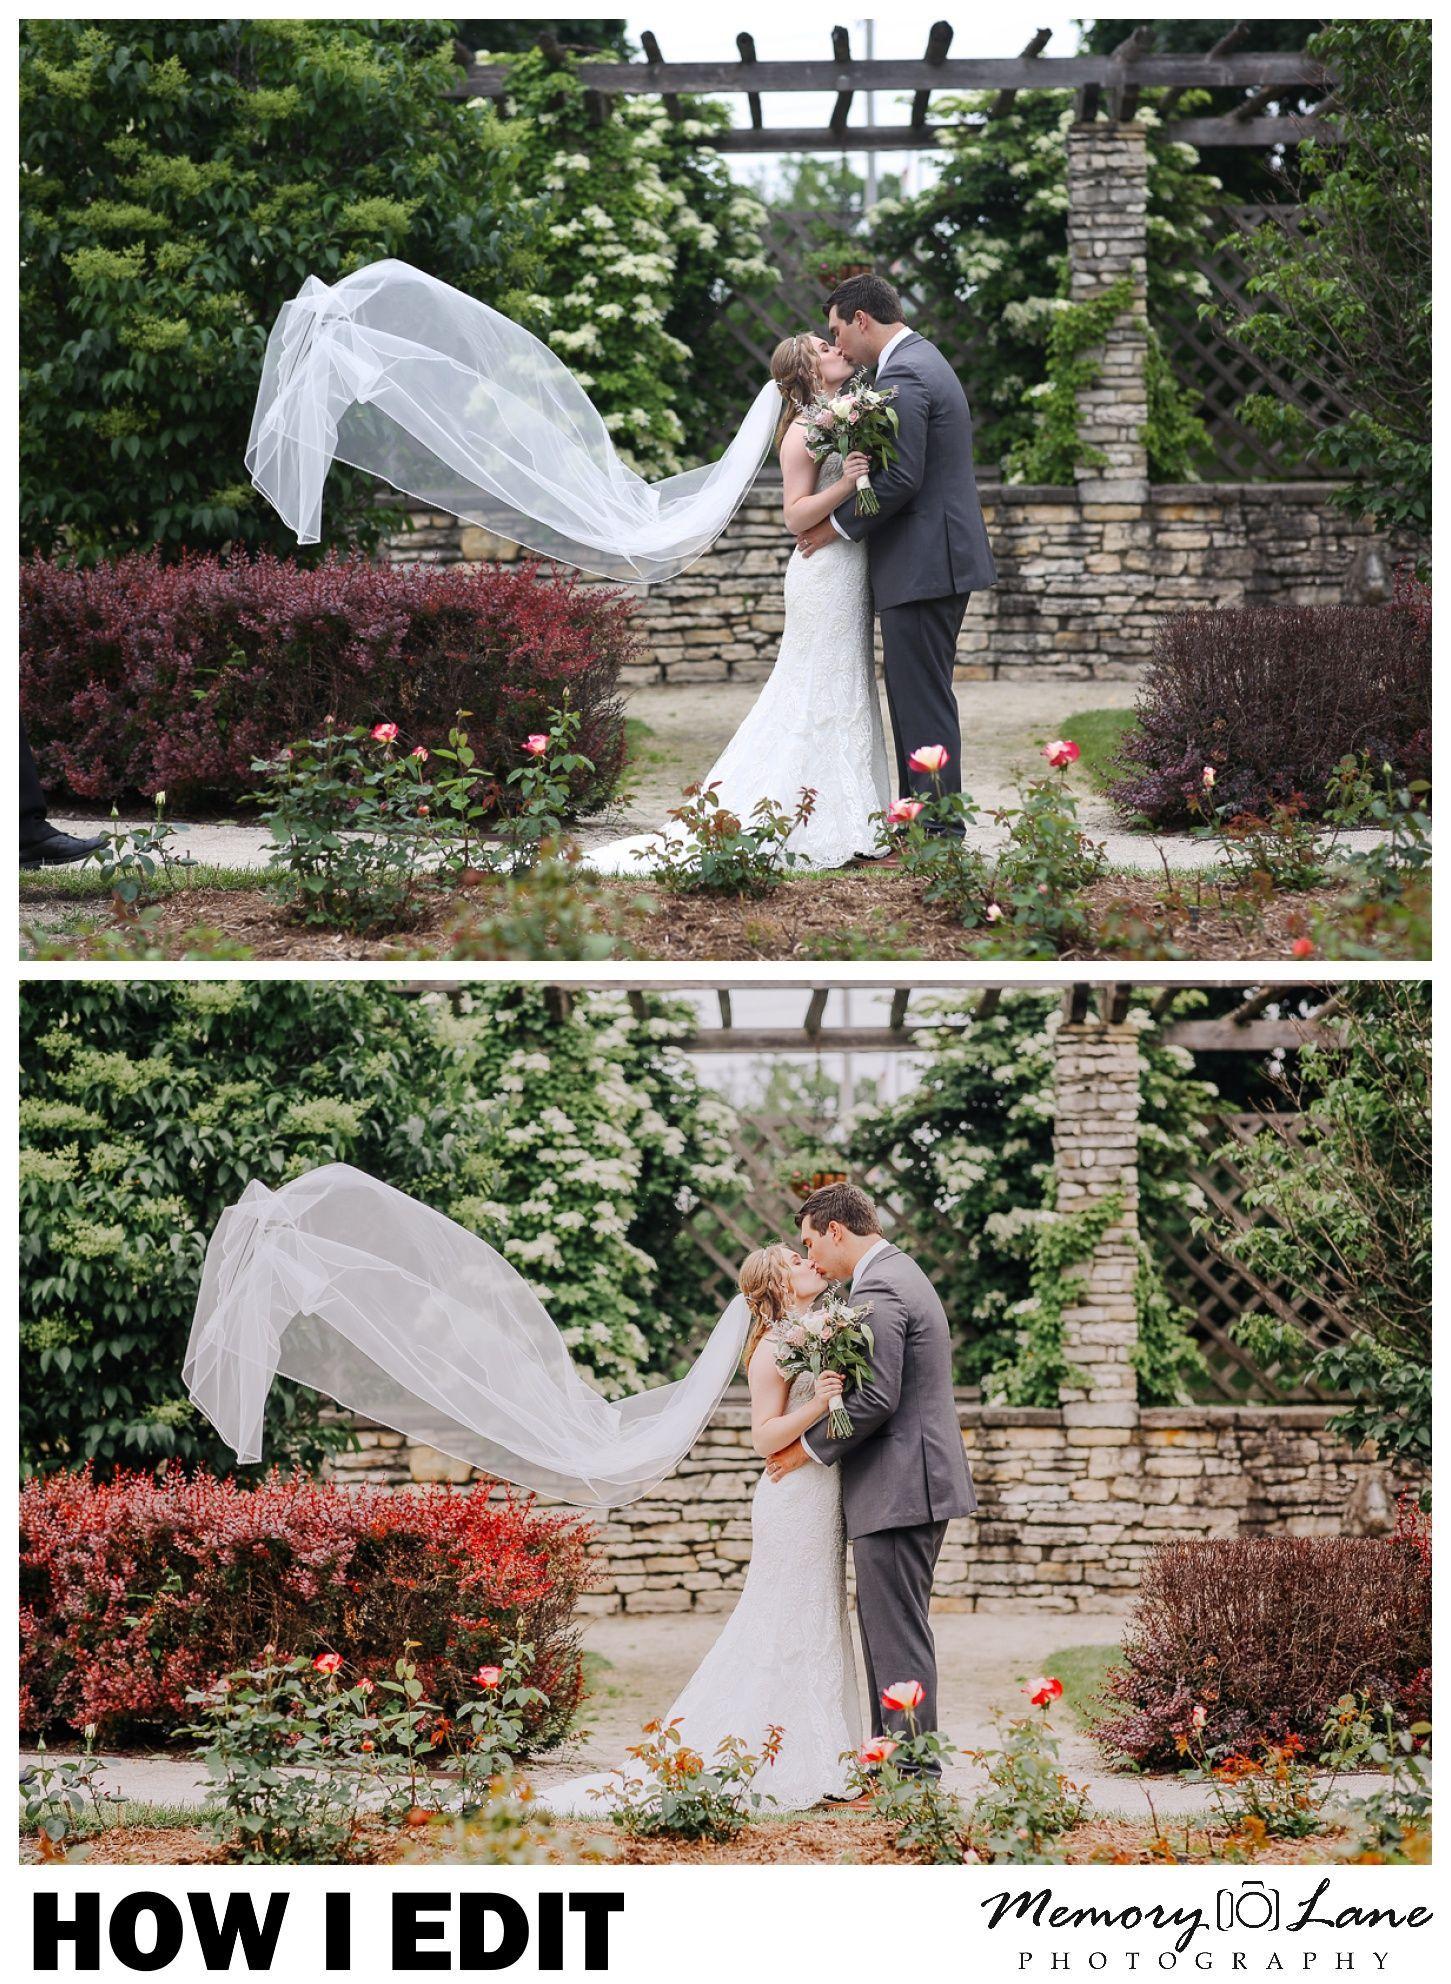 How to edit wedding photos